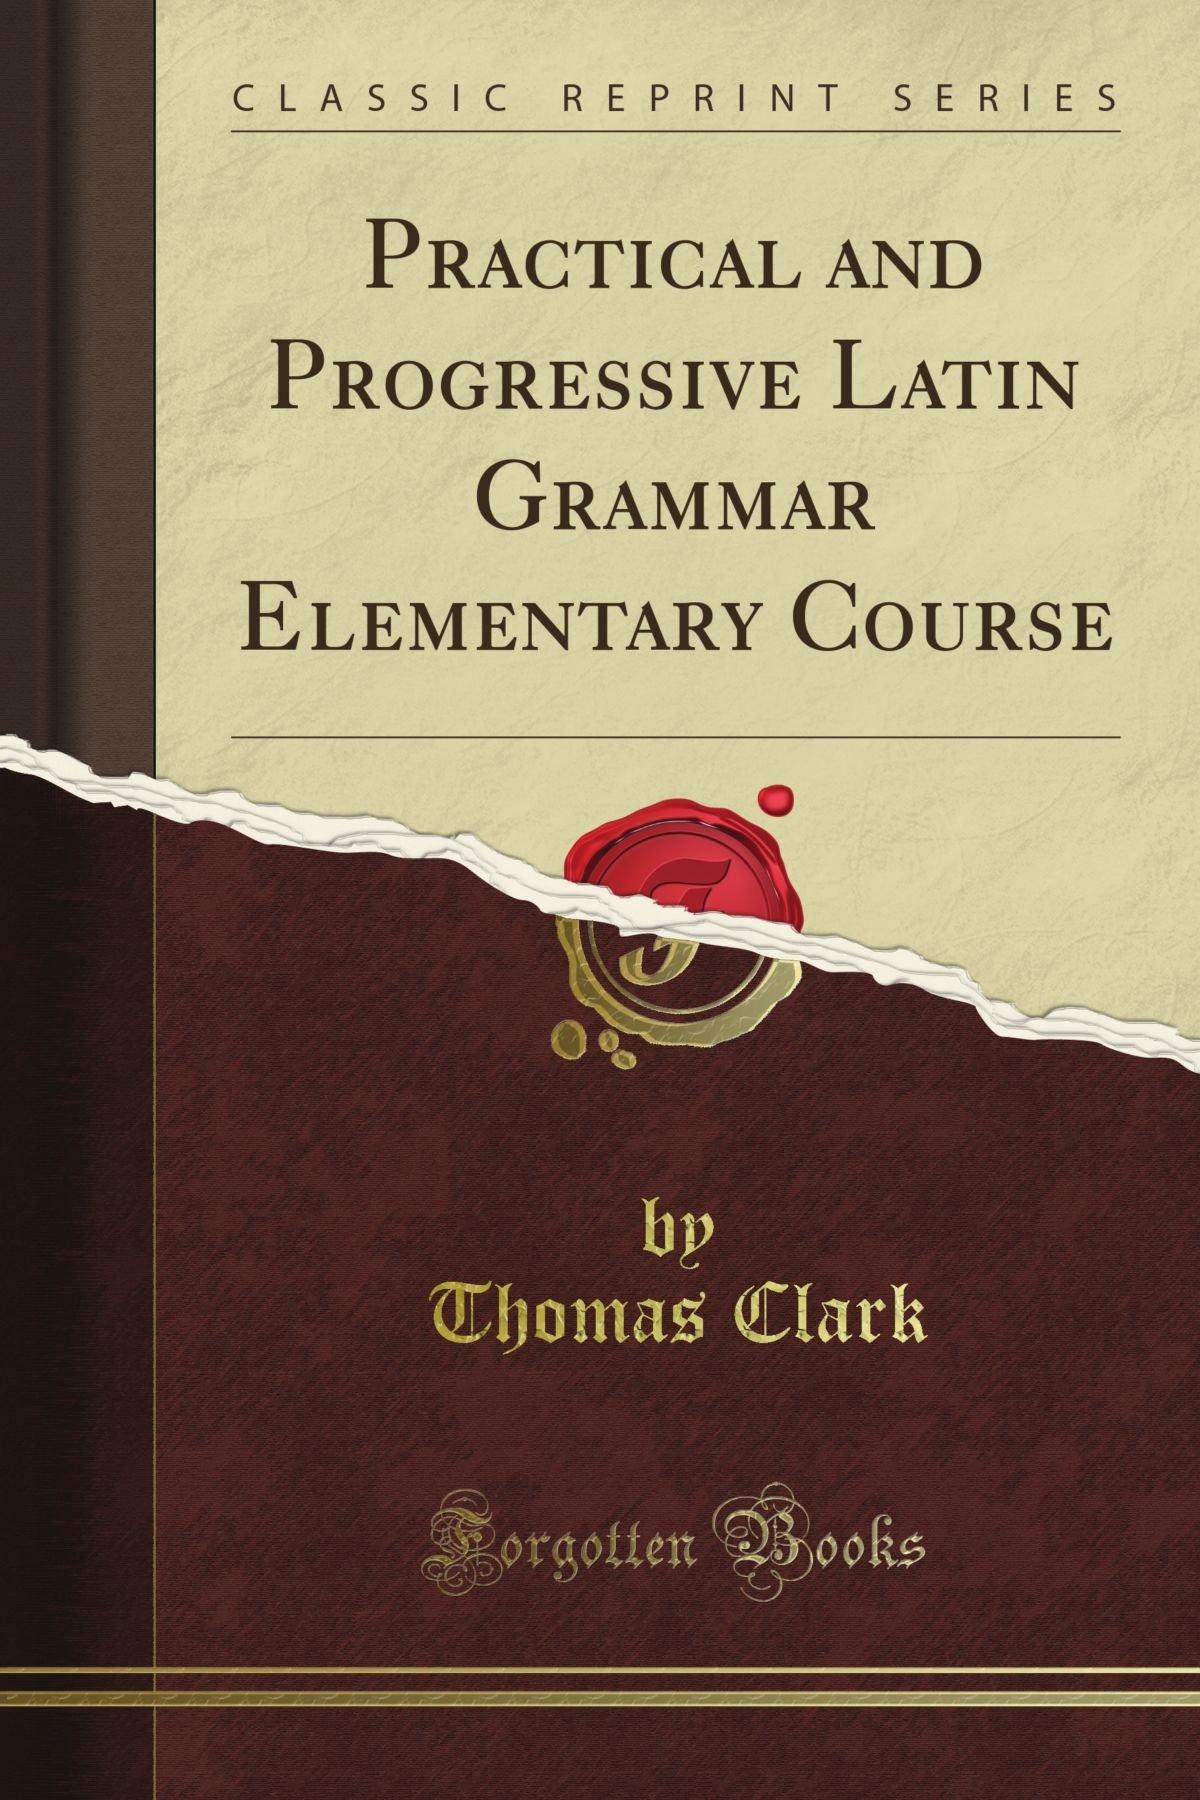 Download Practical and Progressive Latin Grammar Elementary Course (Classic Reprint) ebook